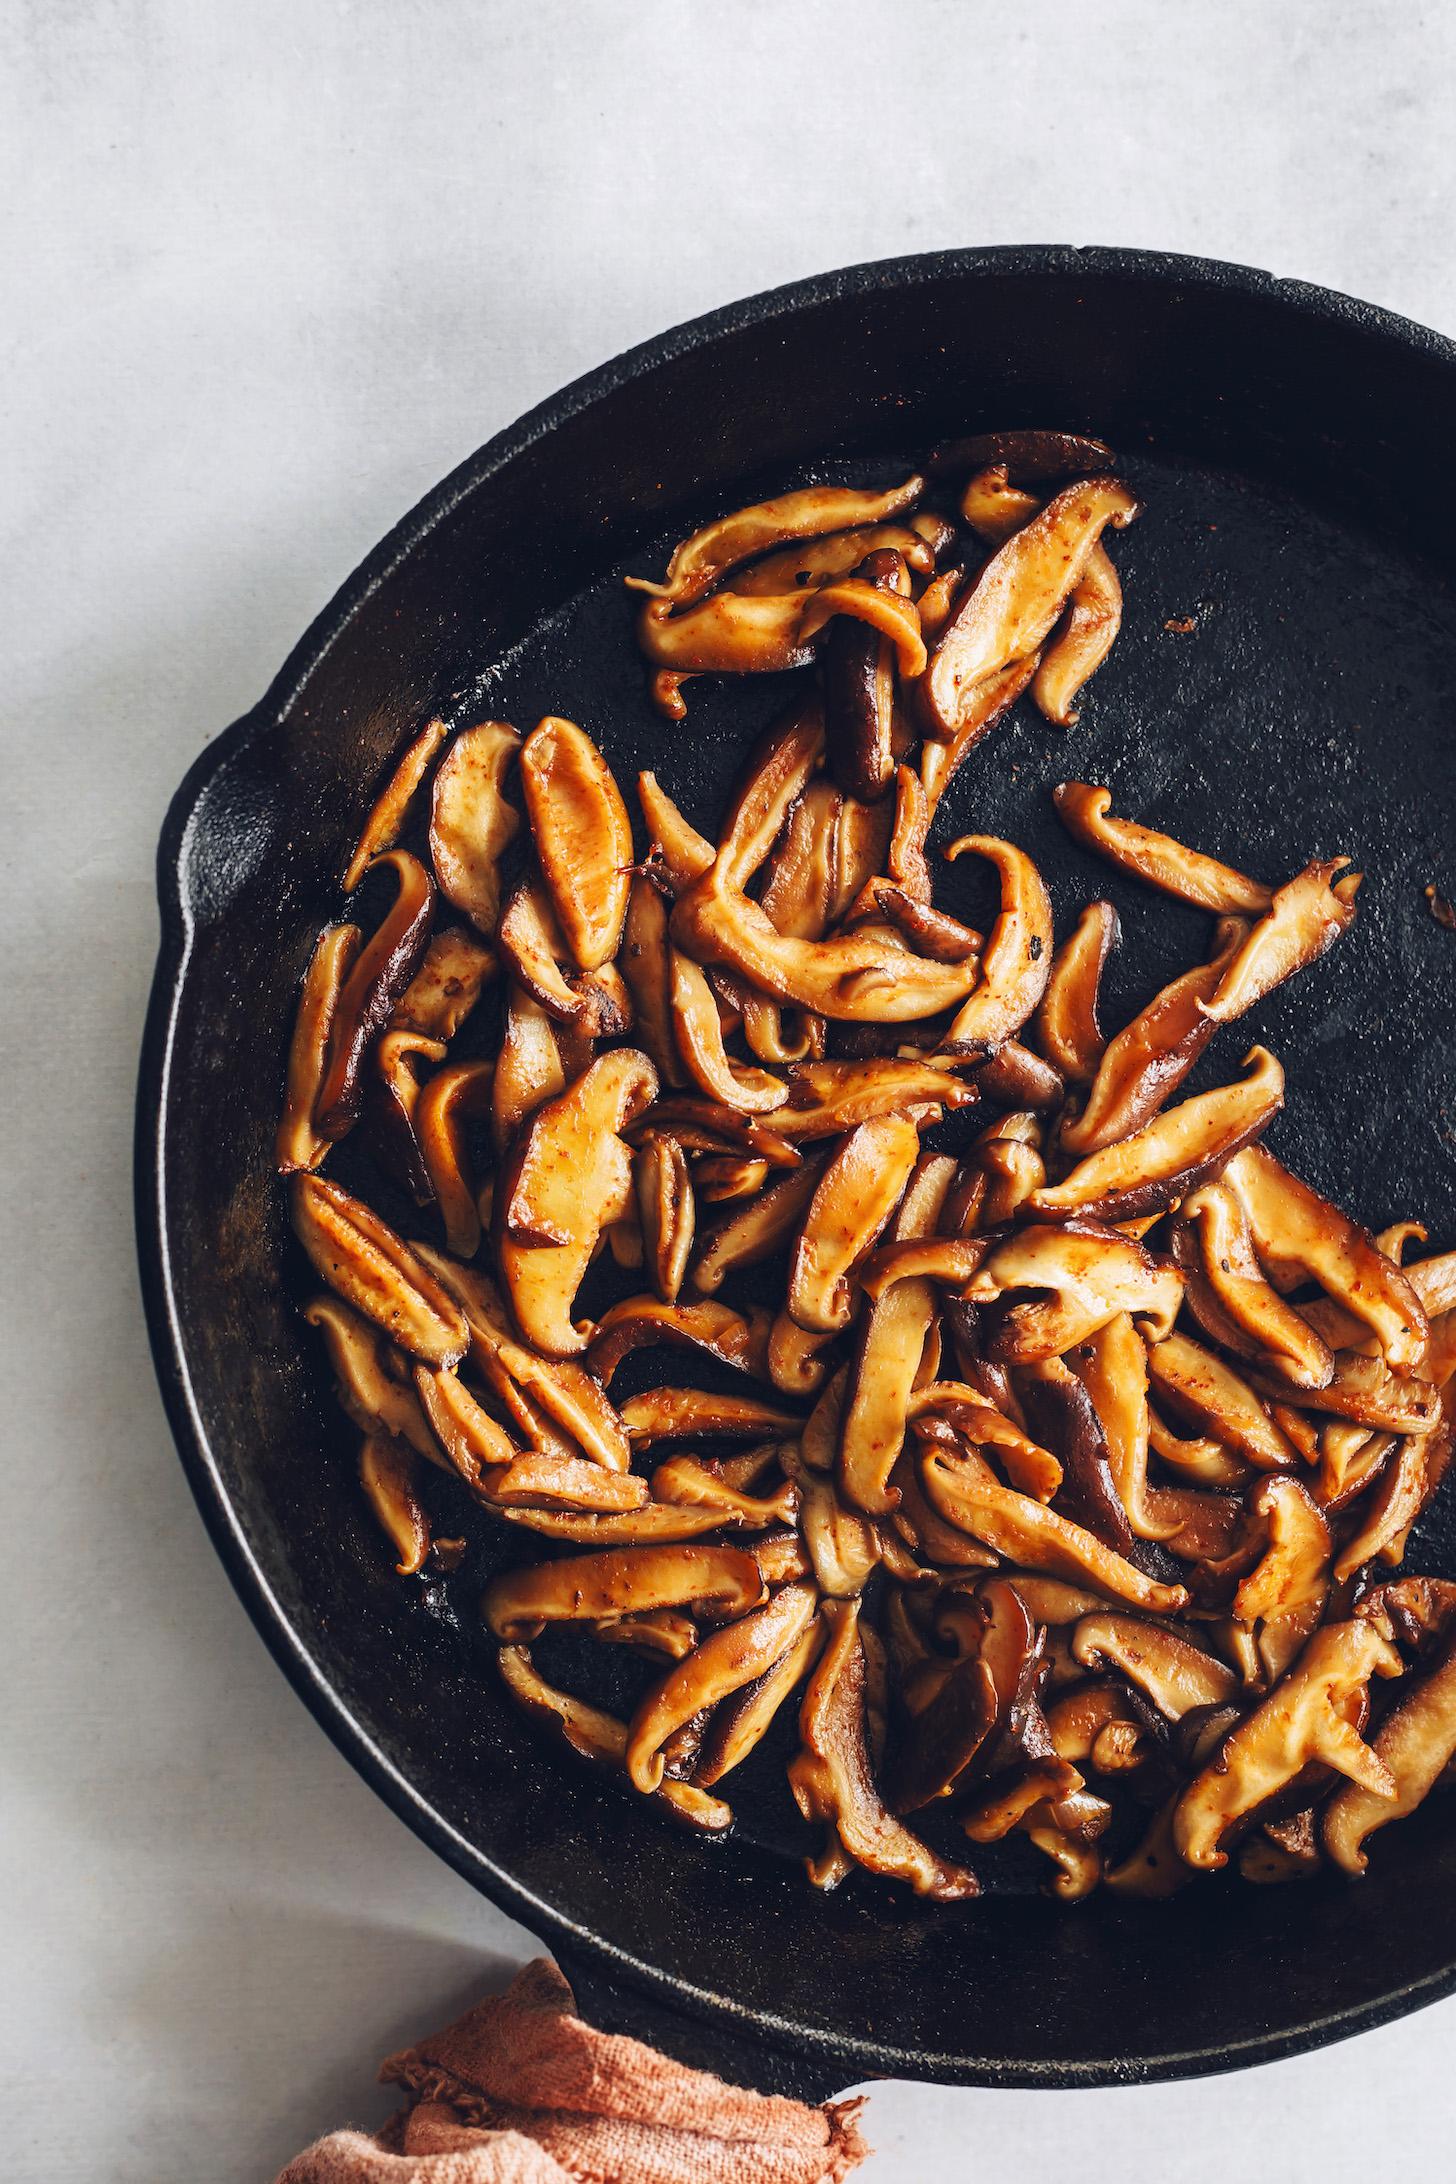 Sliced shiitake mushrooms in a cast iron skillet coated in seasonings